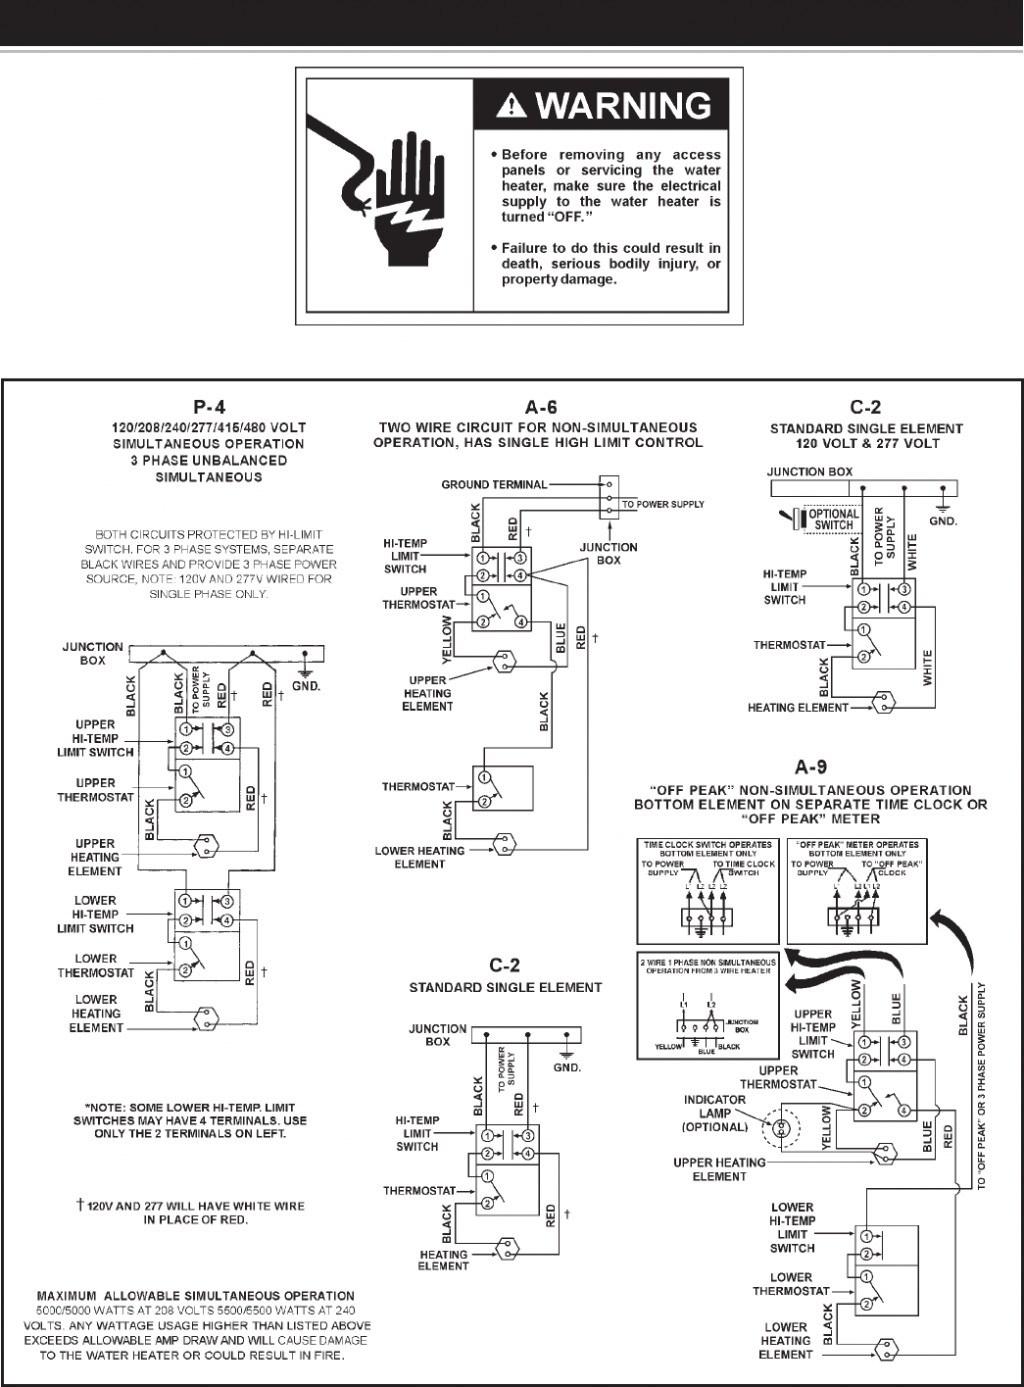 Century D1026 Wiring 220 Wiring Diagram   Wiring Diagram - A.o.smith Motors Wiring Diagram